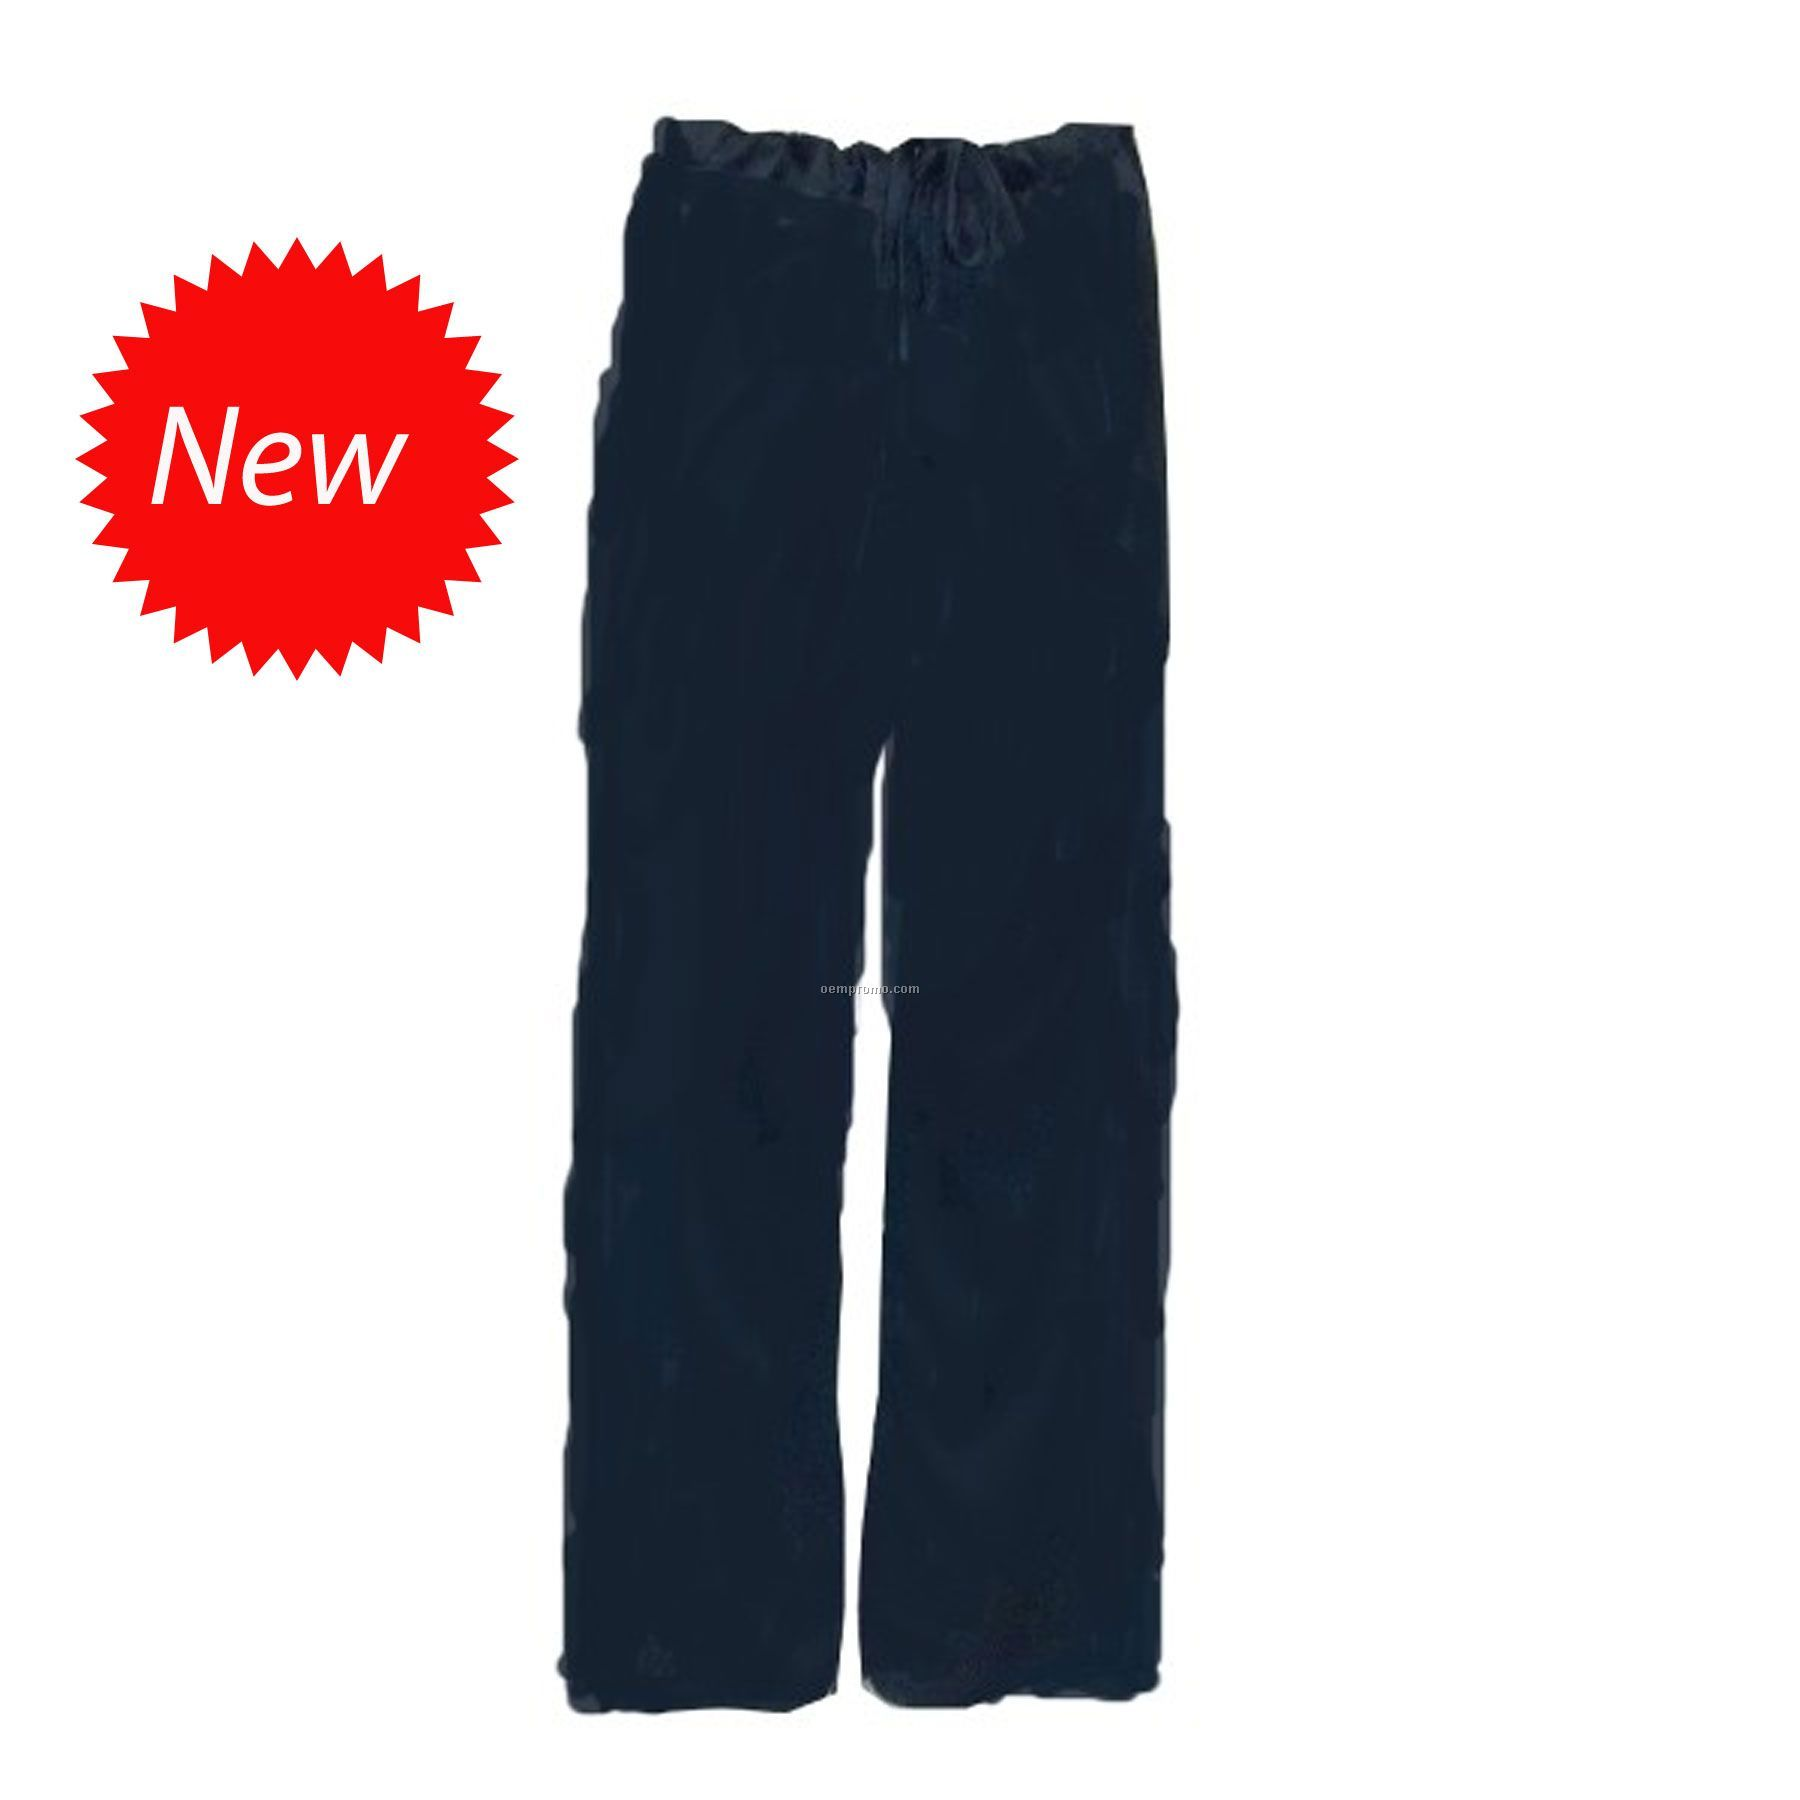 Microfiber Ladies Drawstring Scrub Pants